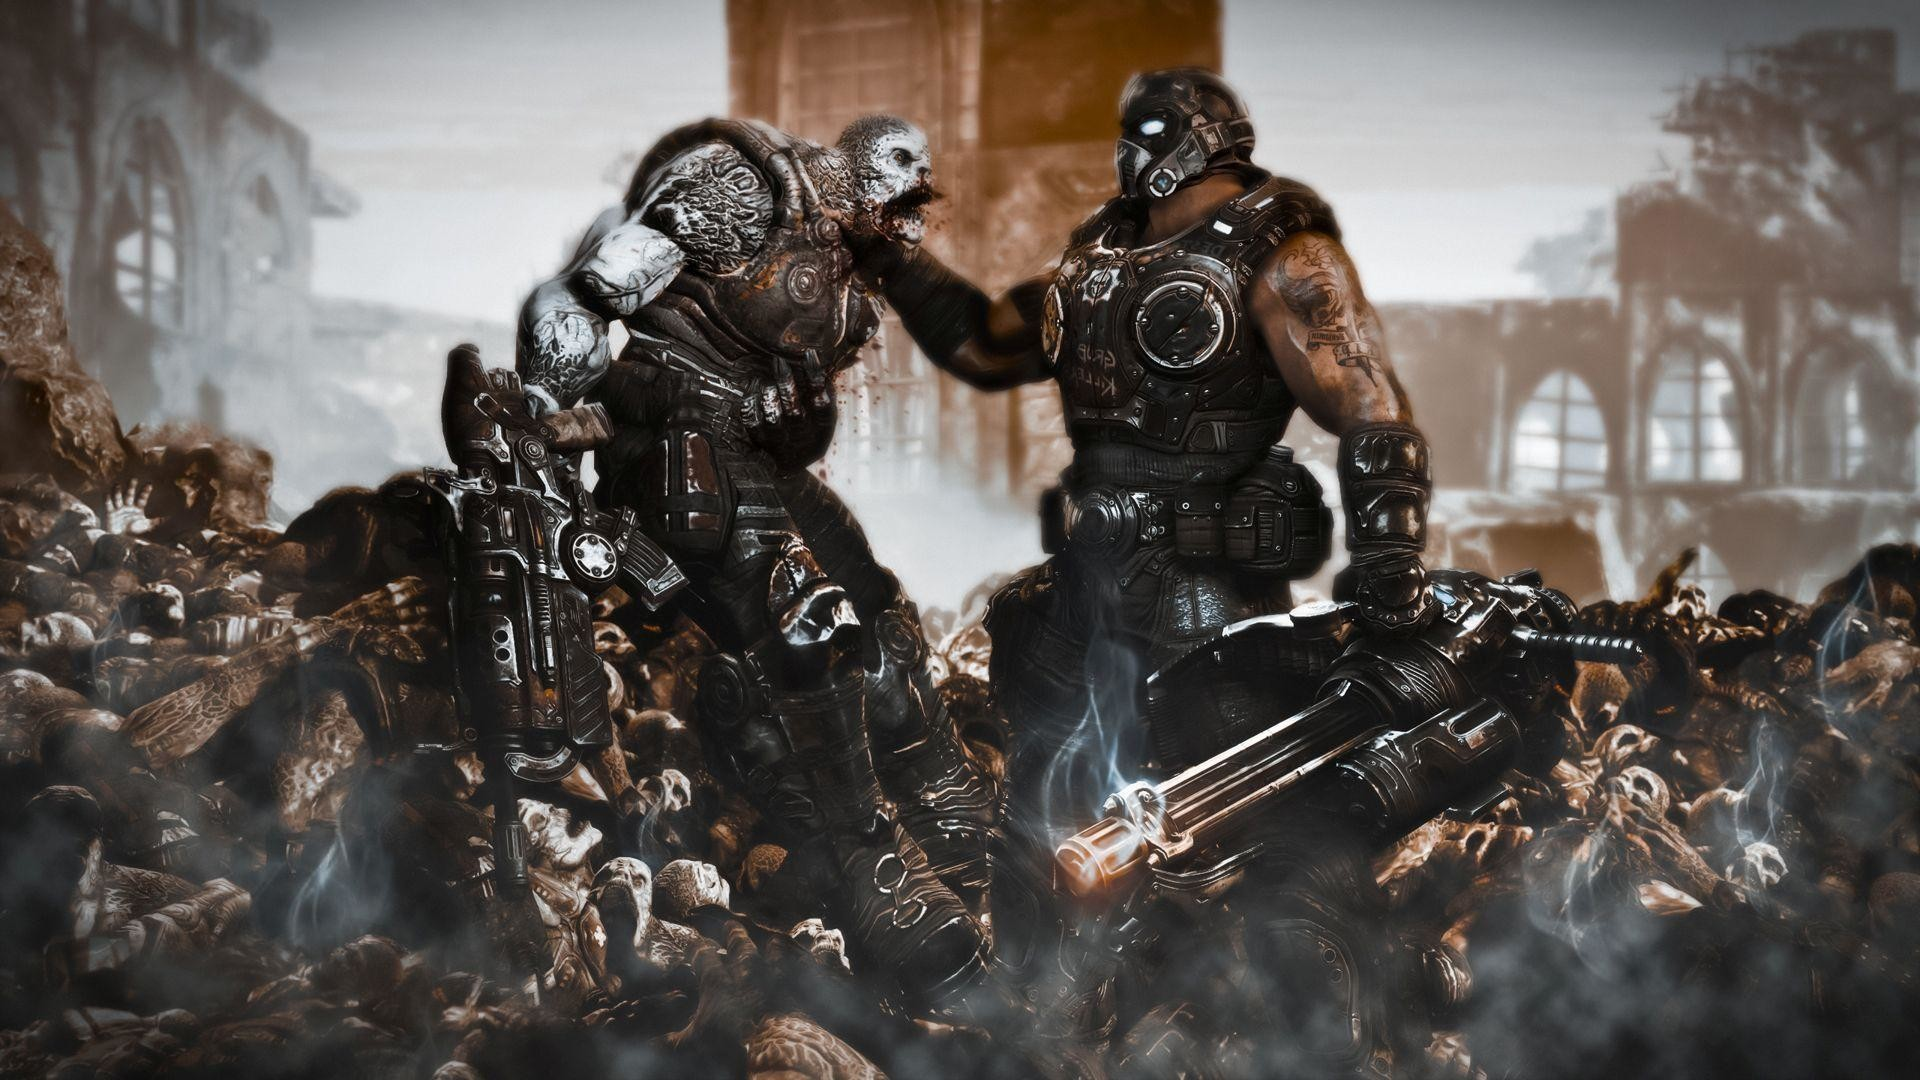 Gears Of War 3 Wallpaper HD (84+ Images